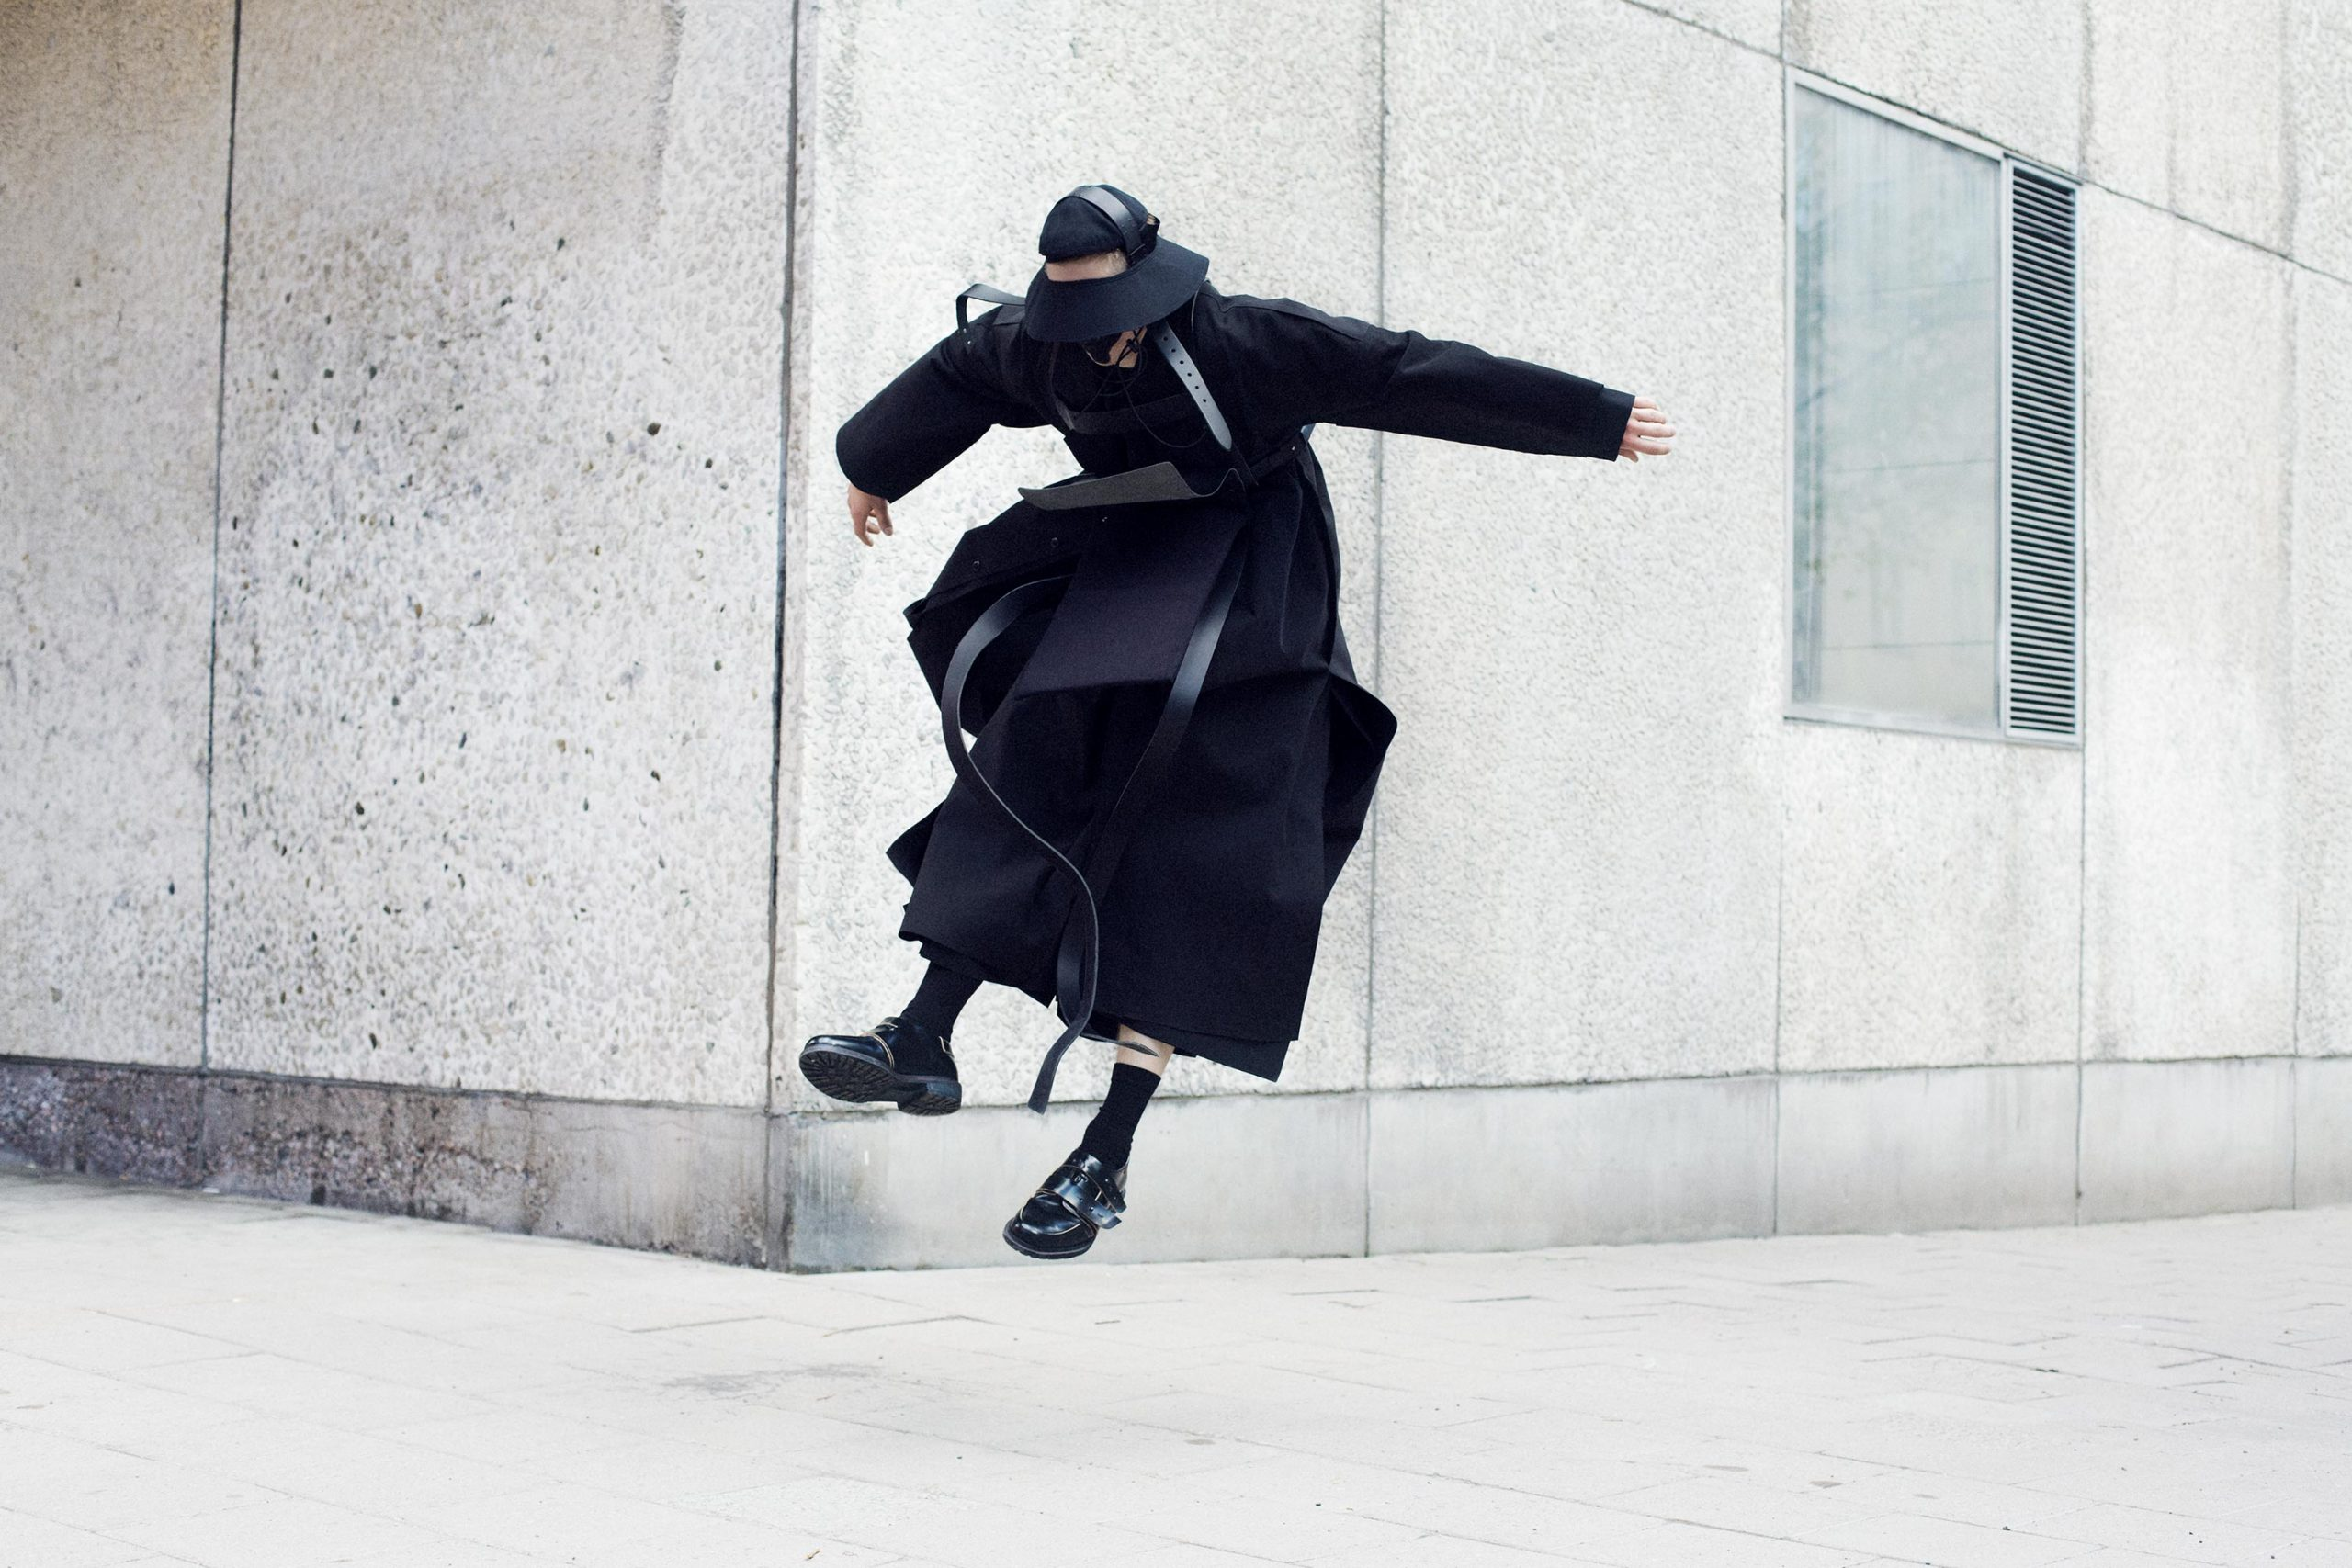 wren-agency-marcus-palmqvist-movement8